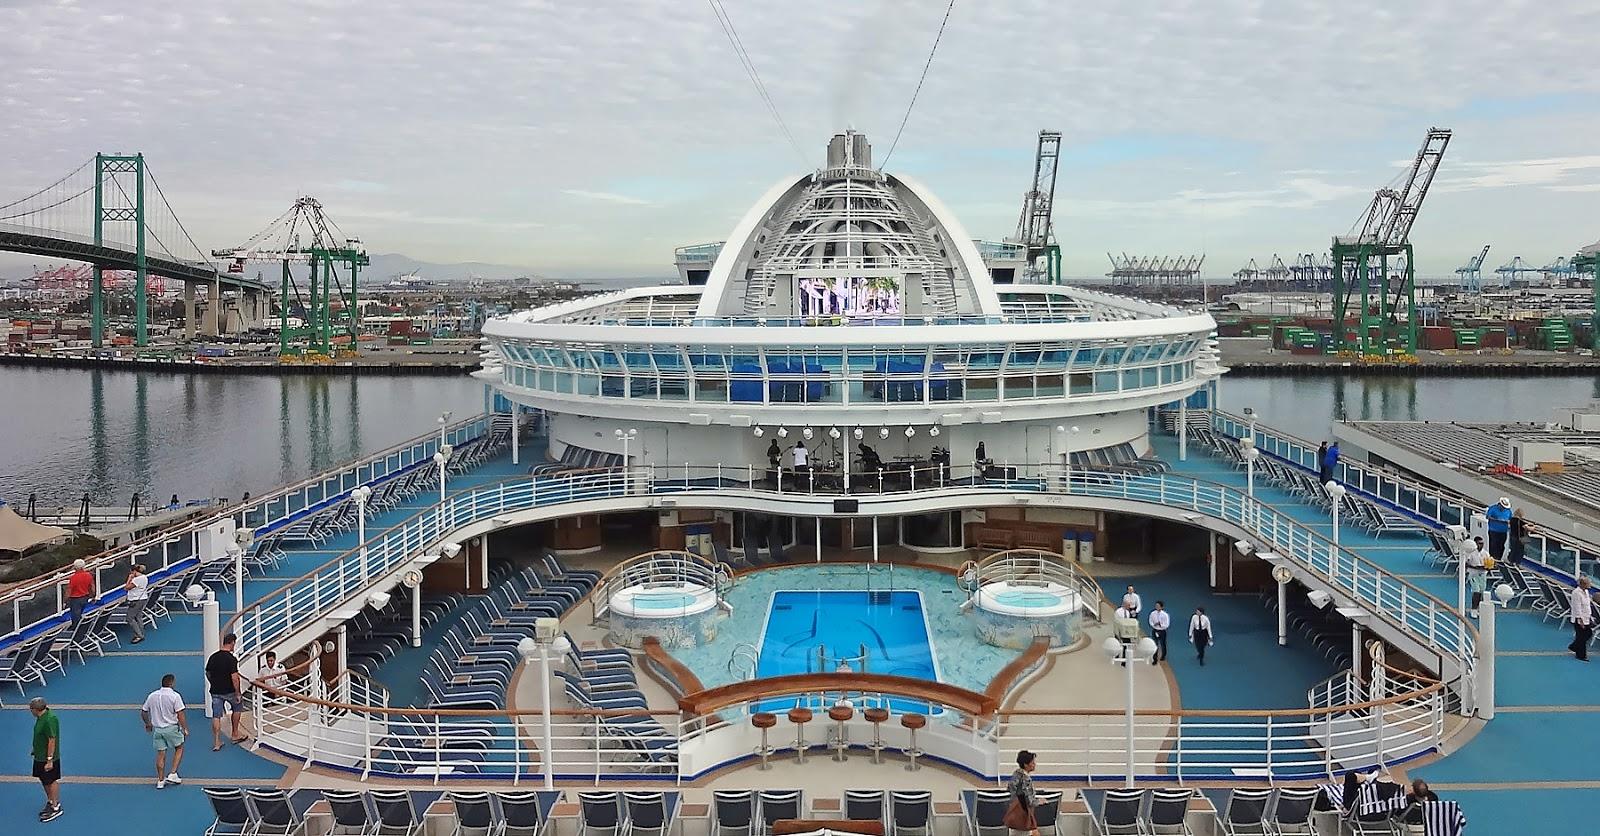 My Cruise Ship Experiences Ruby Princess November 2016